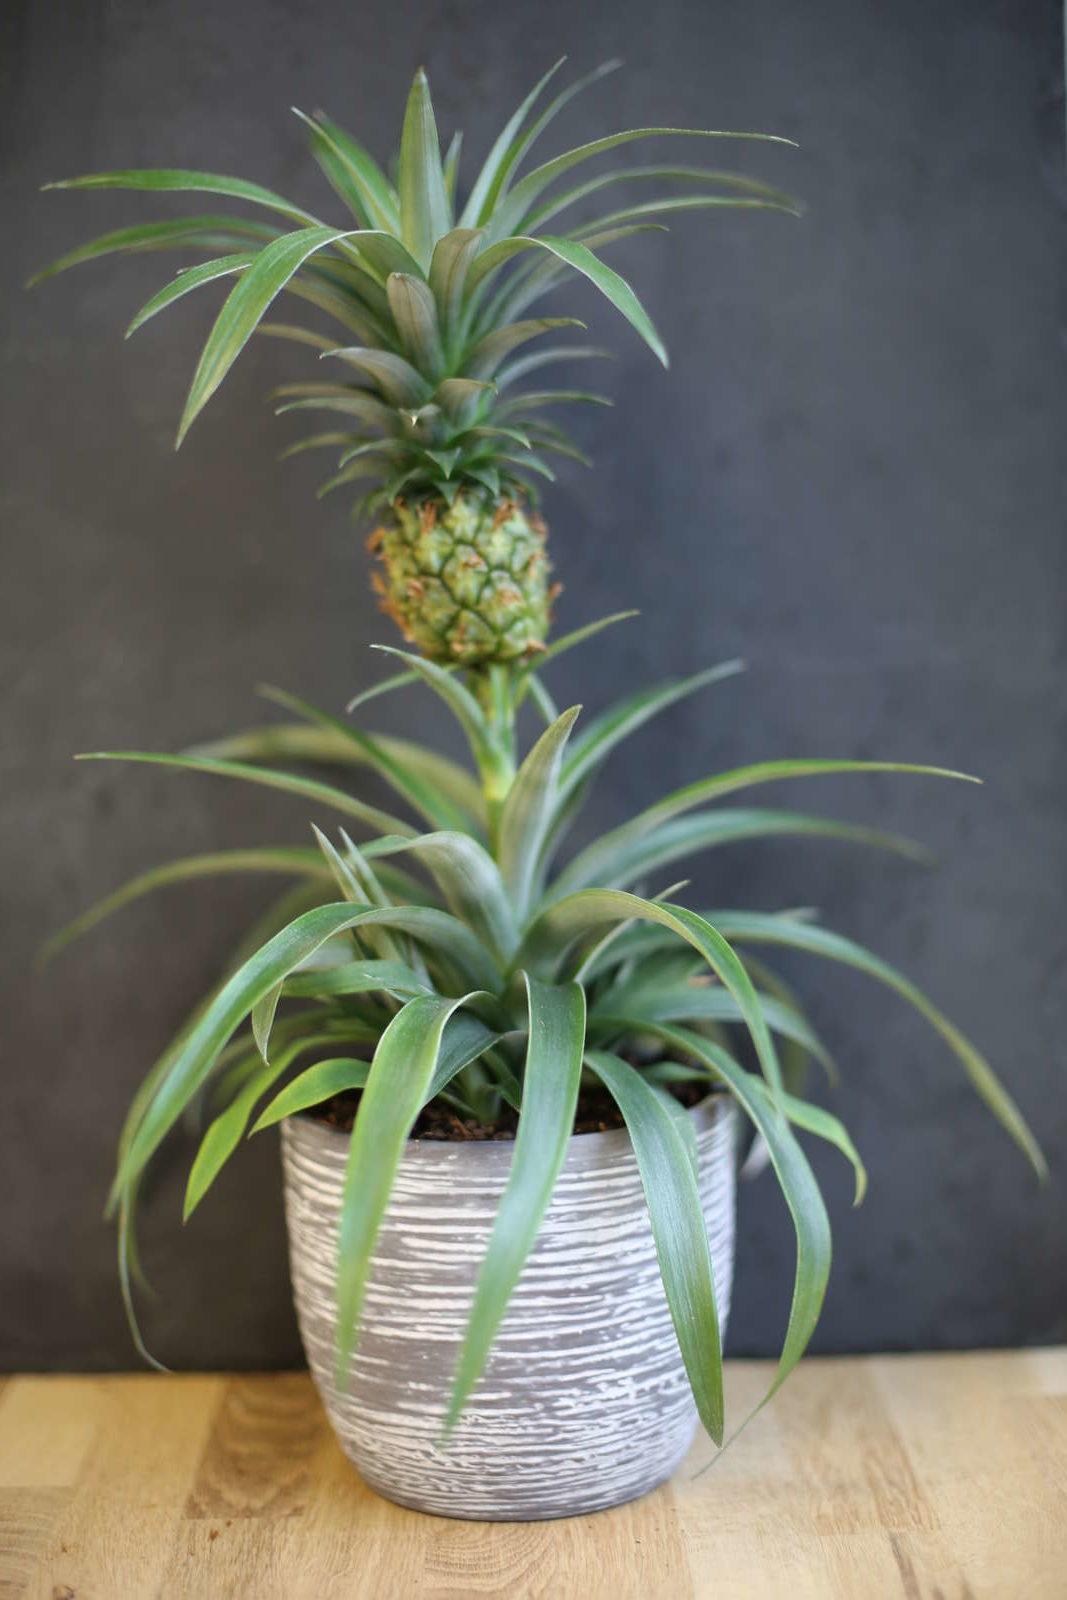 ananas anpflanzen vermehrung anbau anleitung plantura. Black Bedroom Furniture Sets. Home Design Ideas